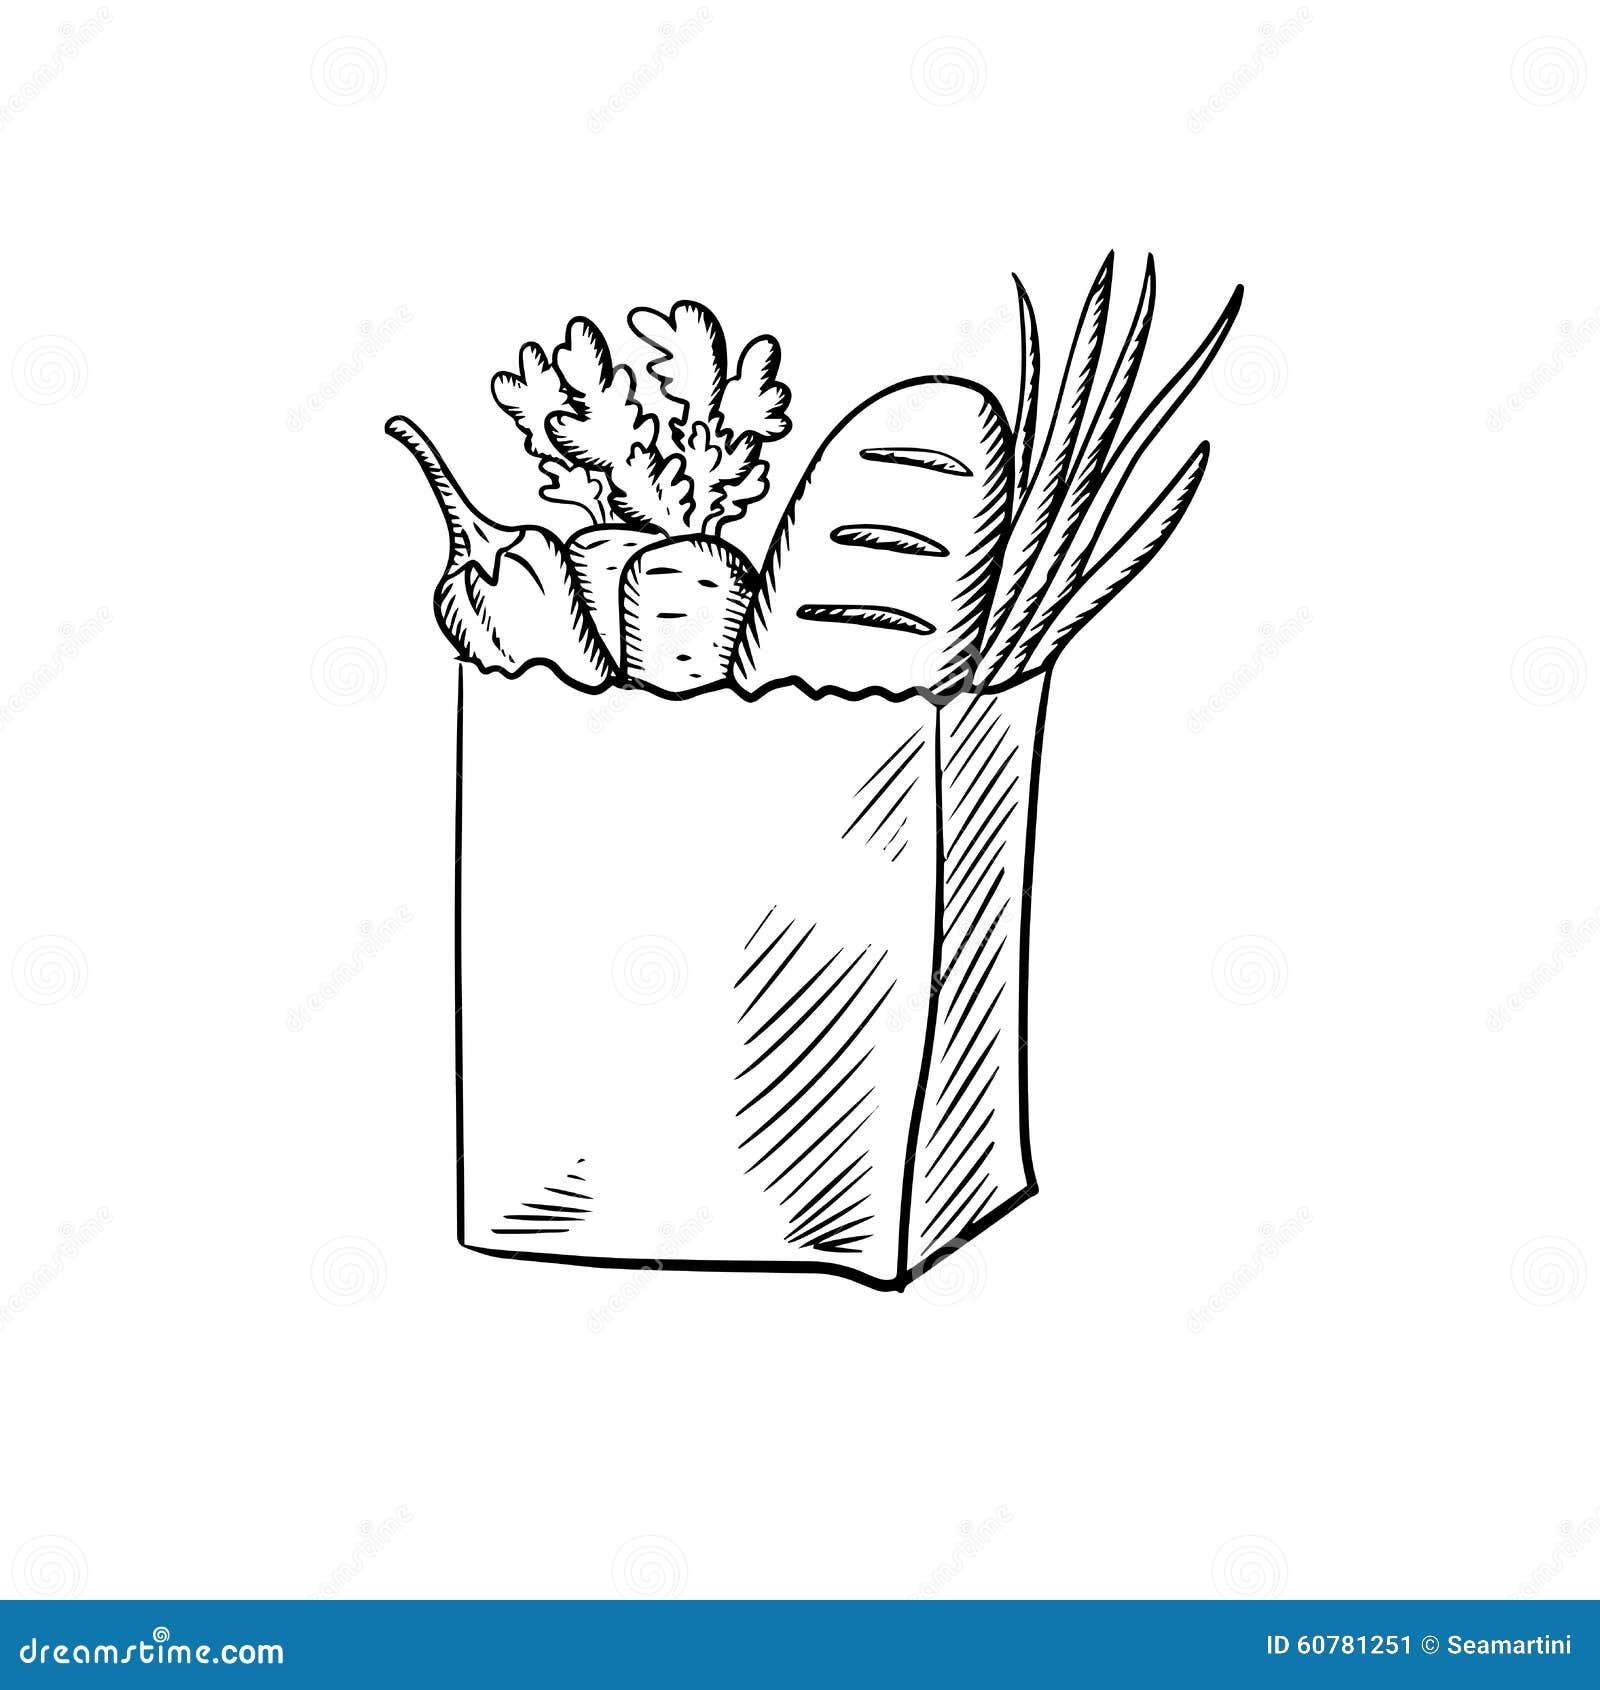 Paper bag sketch - Fresh Vegetables And Bread In Paper Bag